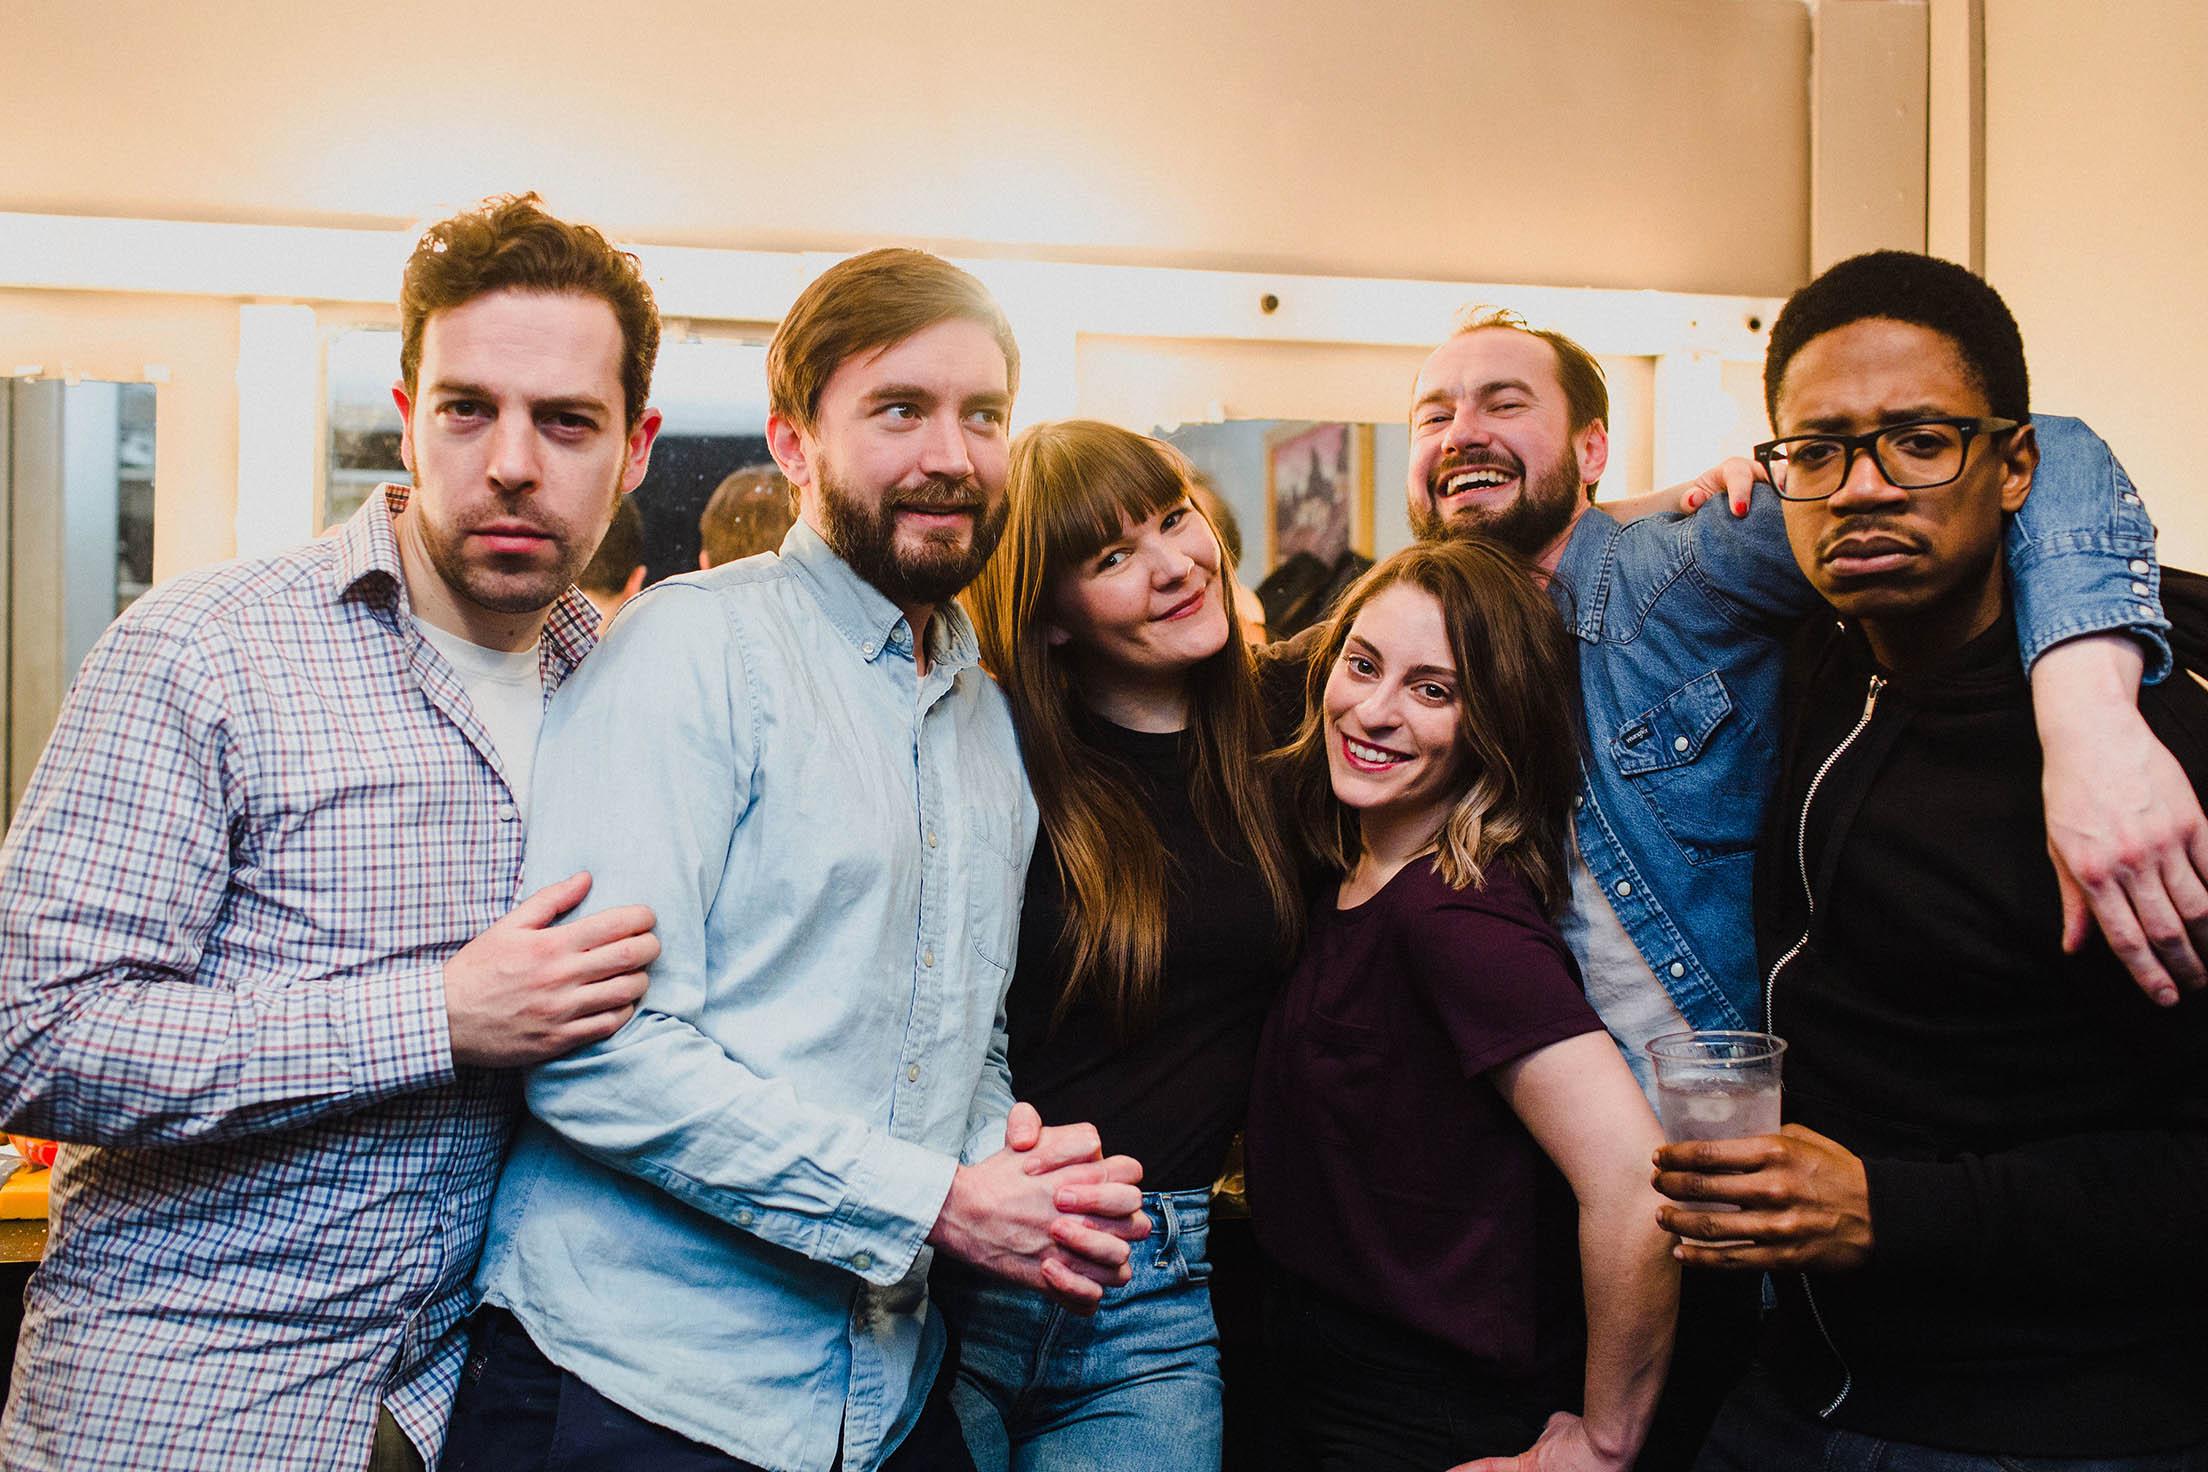 Comedians Michael Balazo, James Hartnett, Sara Hennessey, Jackie Pirico, Jordan Foisy, and Chris Sandiford